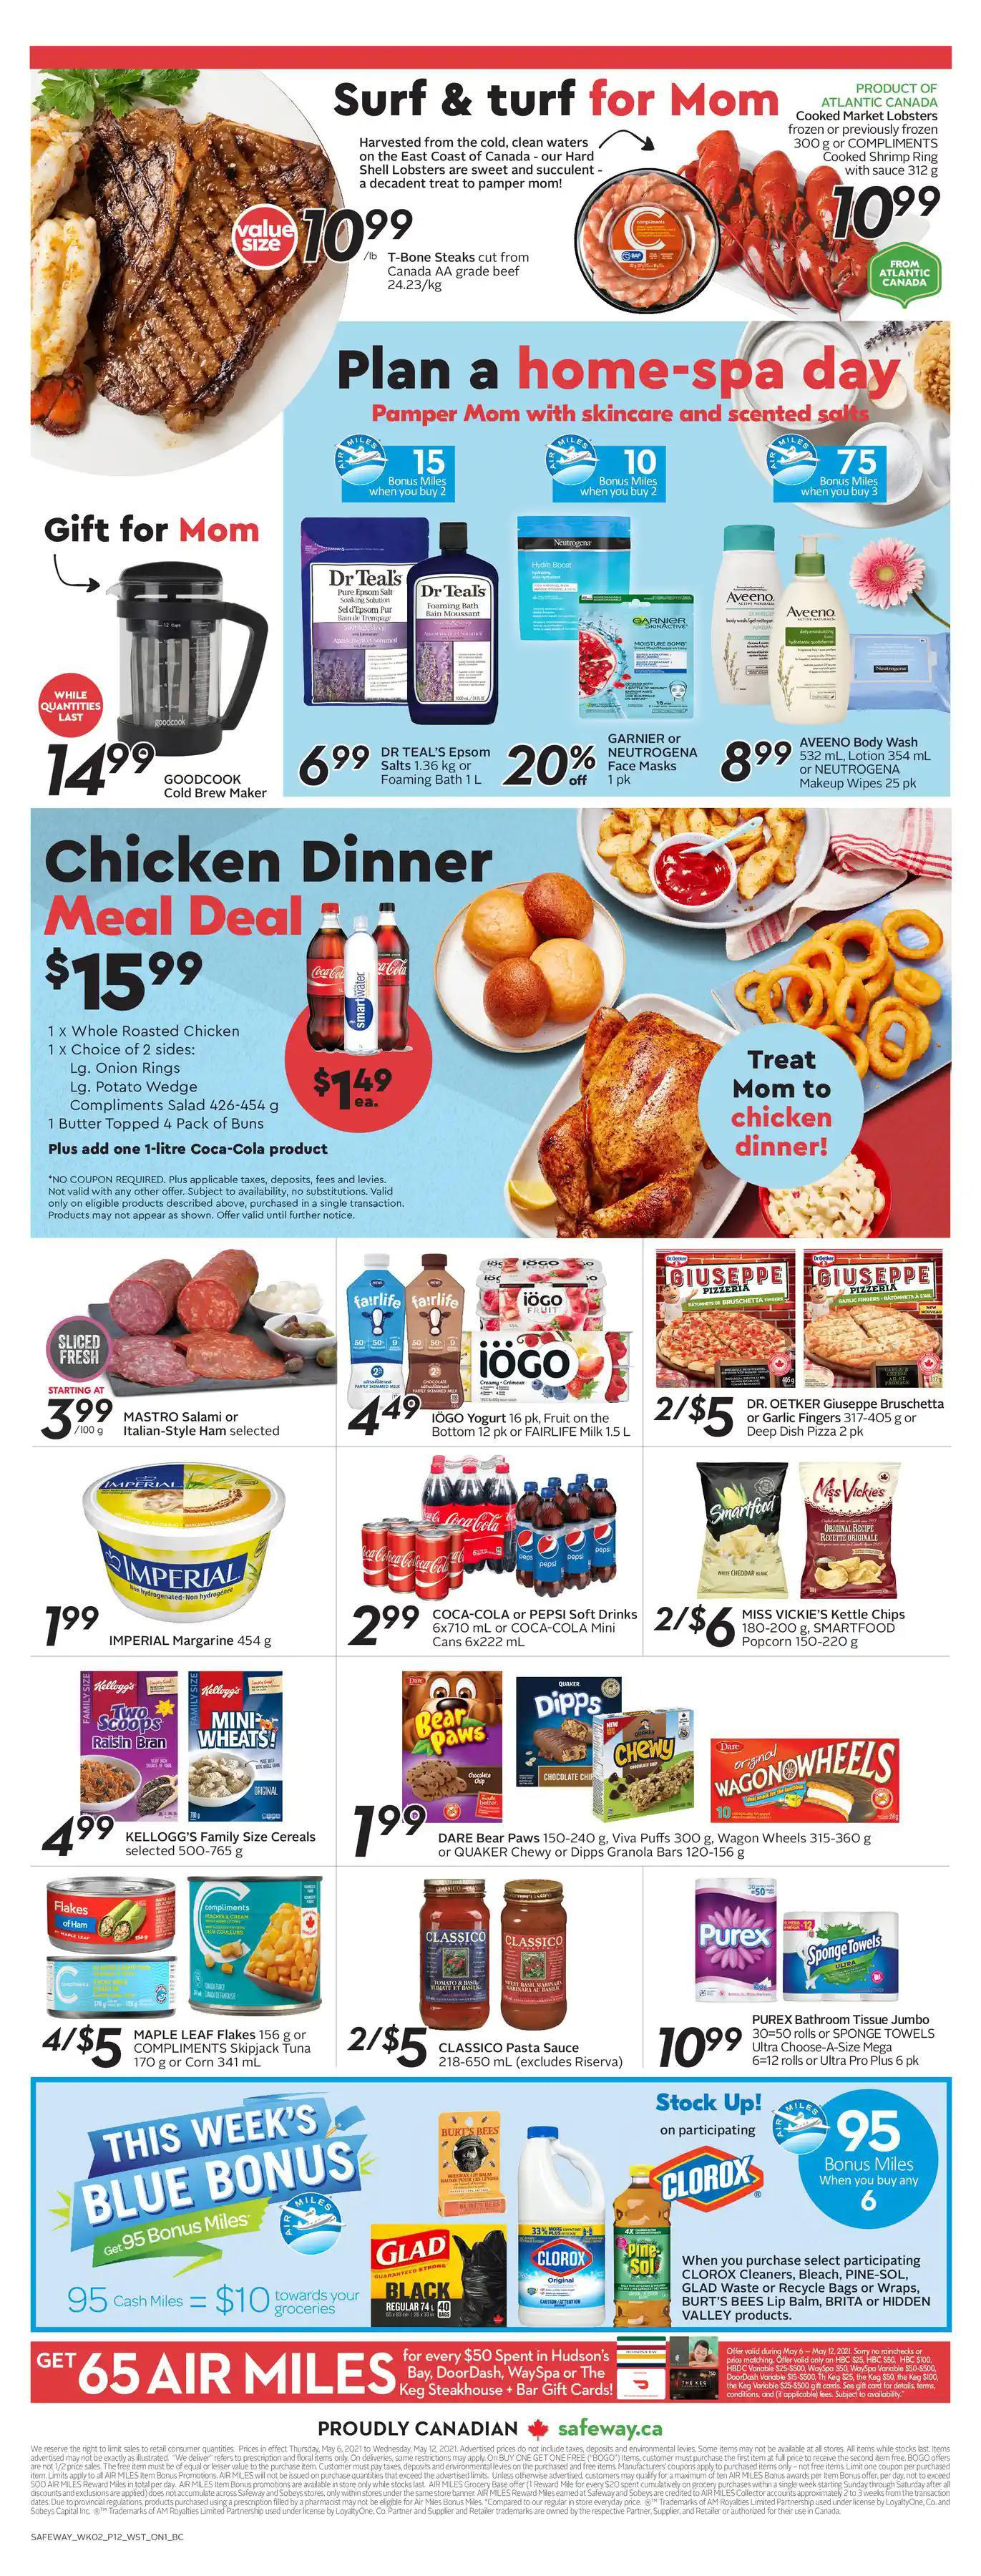 Safeway - Weekly Flyer Specials - Page 13